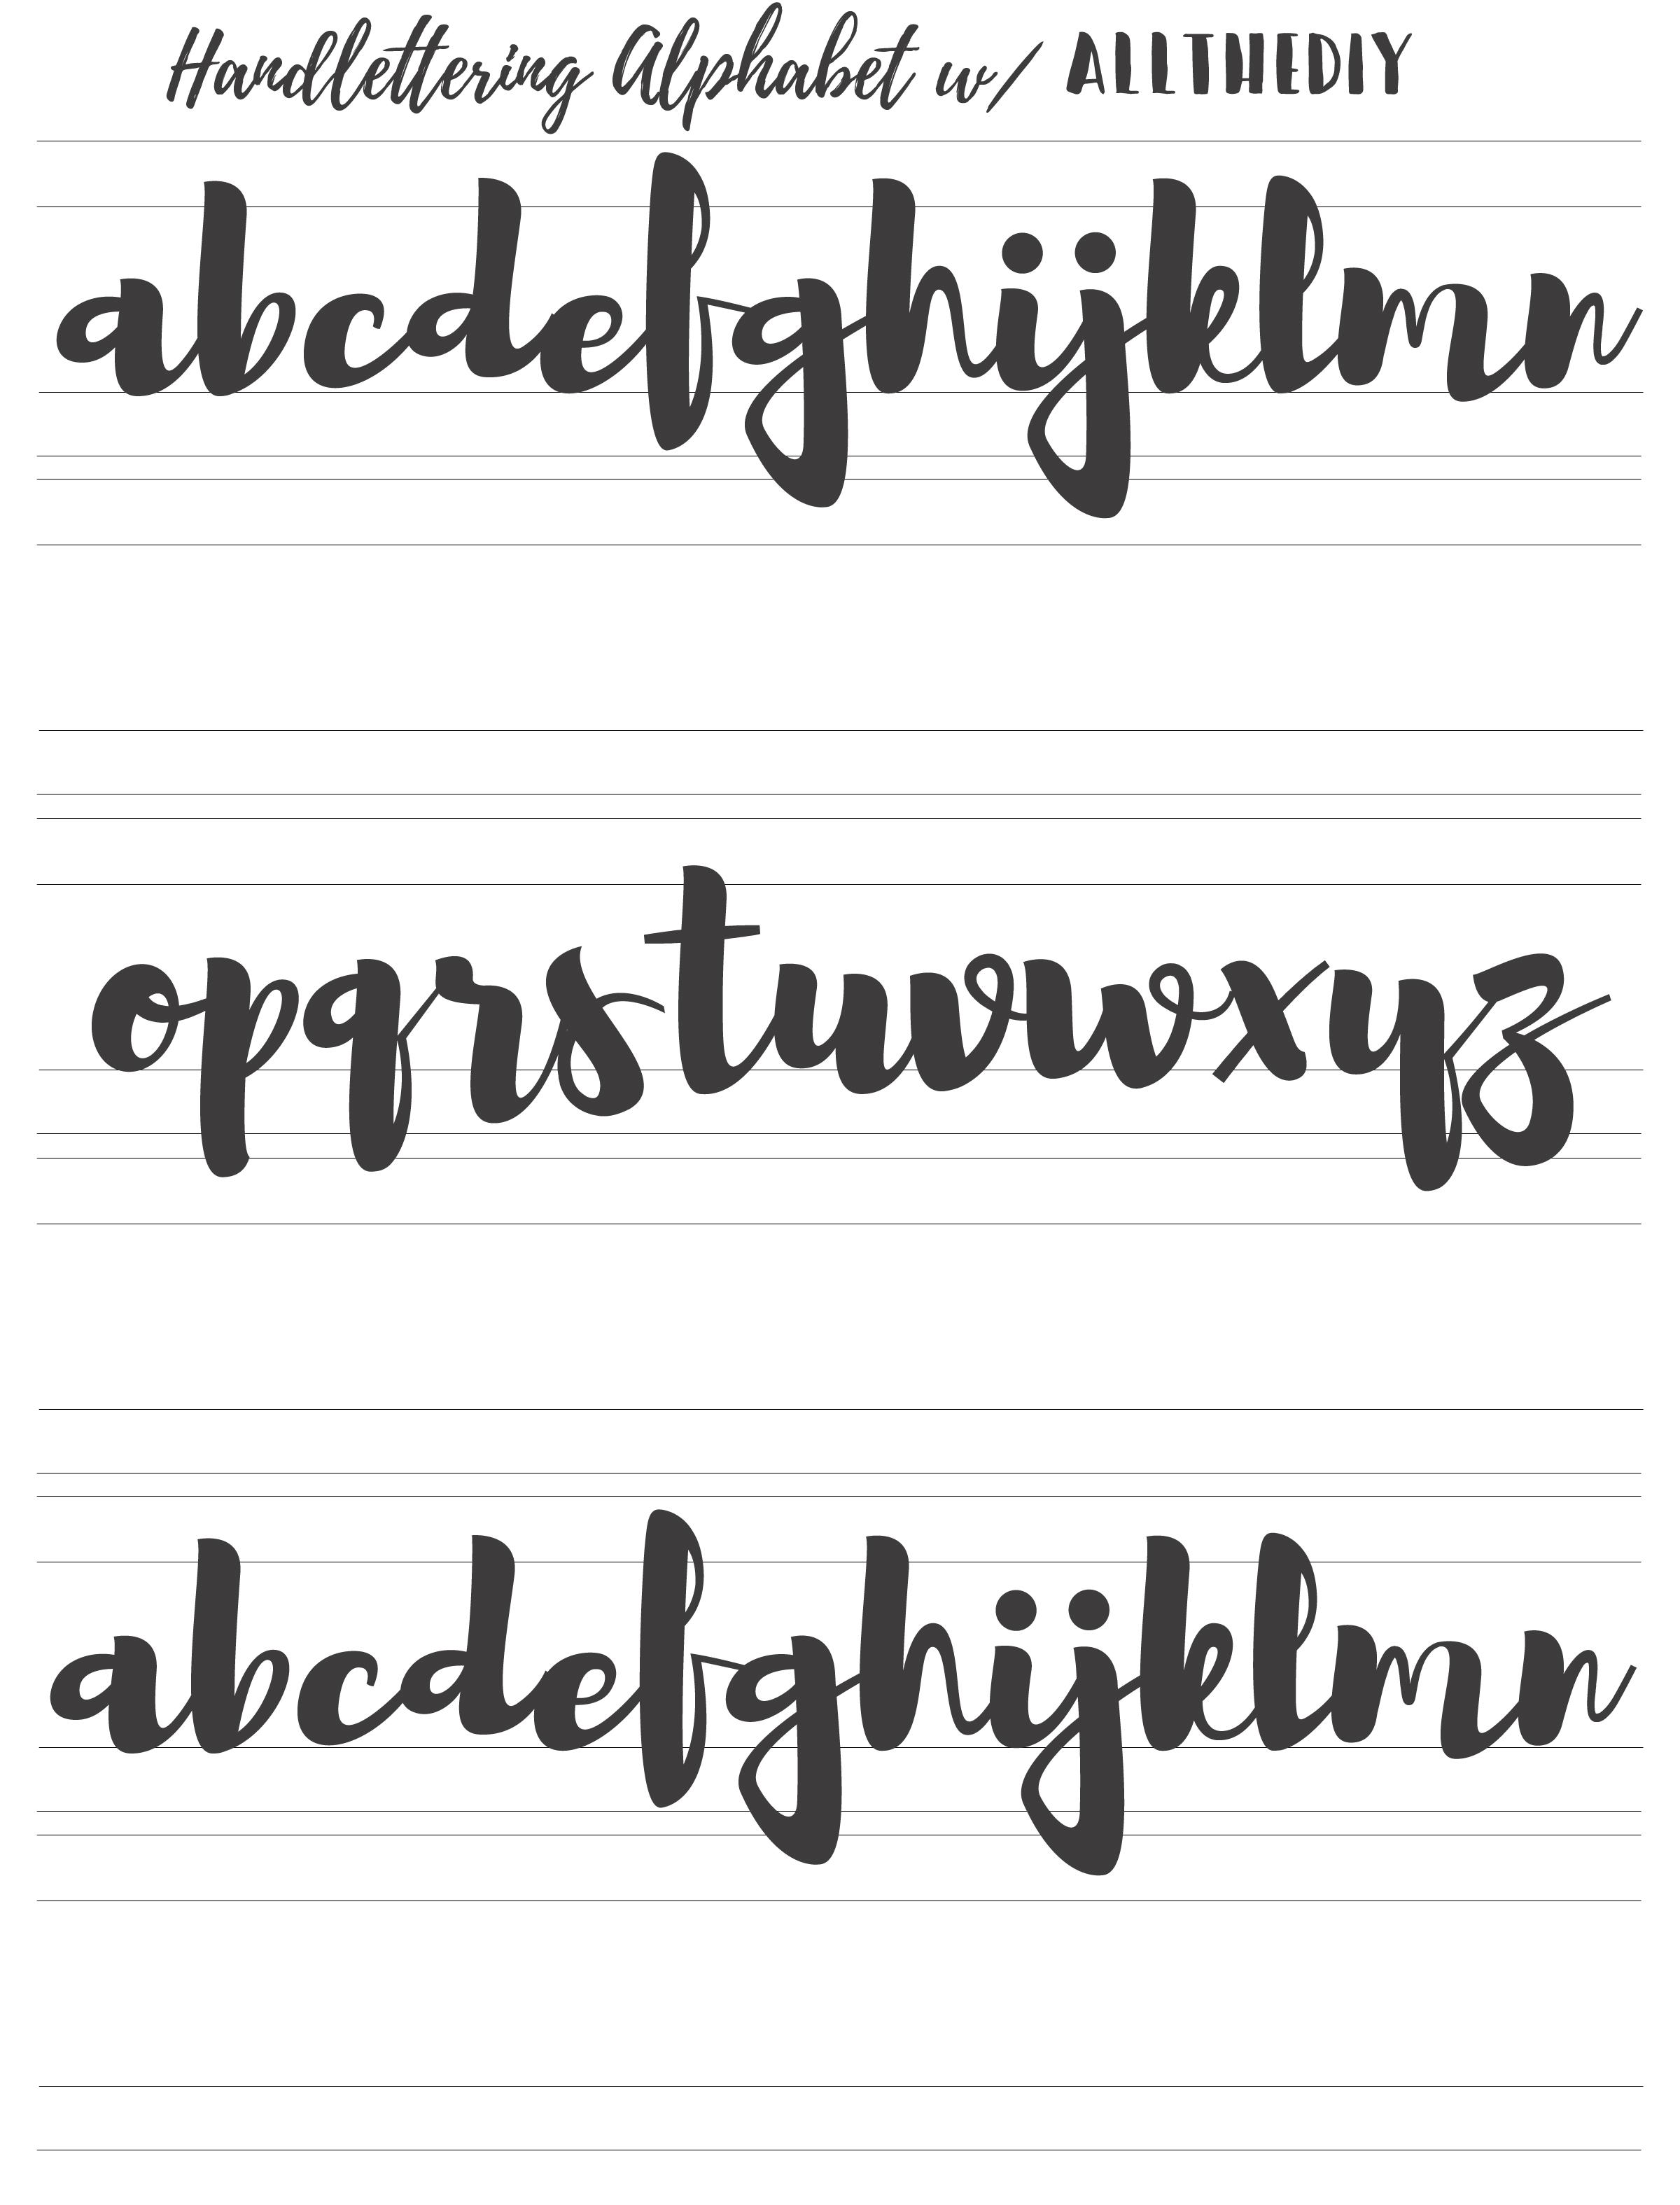 7 Best Hand Lettering Tips for Beginners Practice